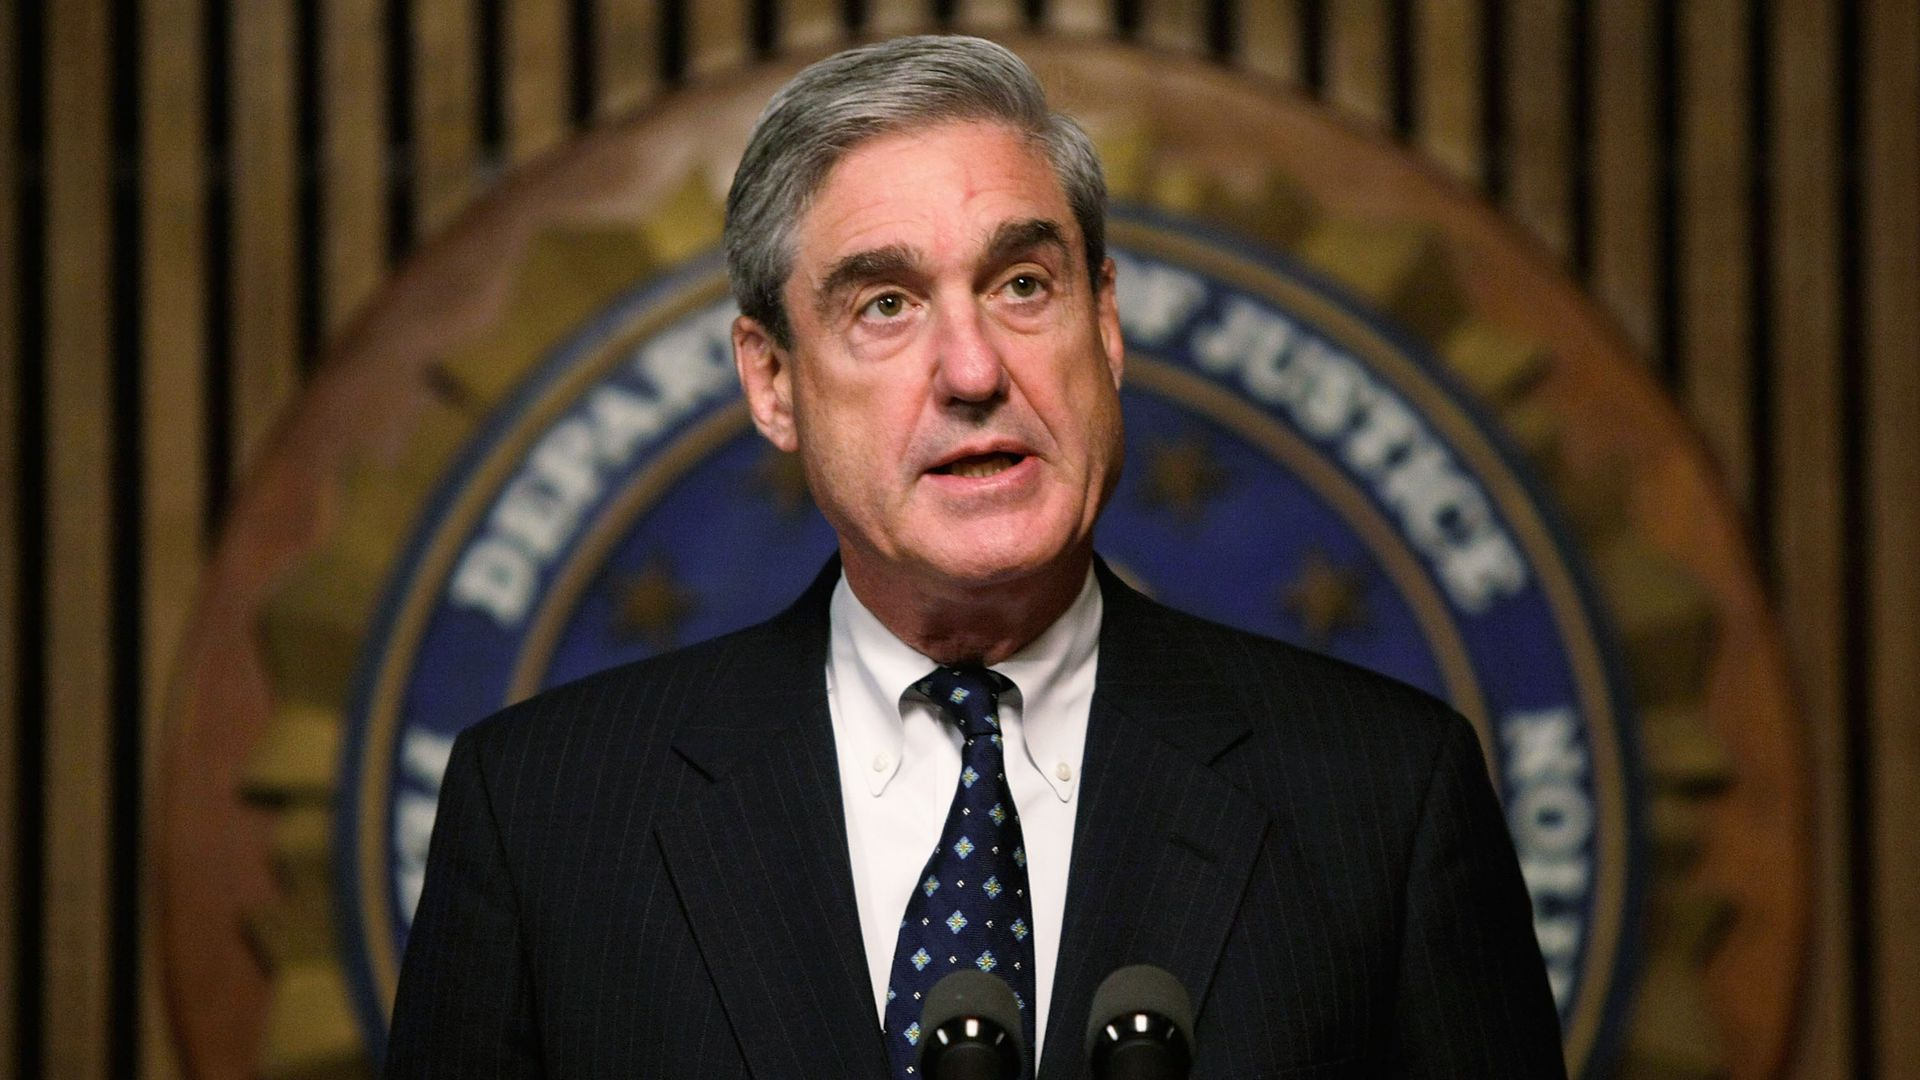 DOJ to send Mueller report redactions to select members of Congress